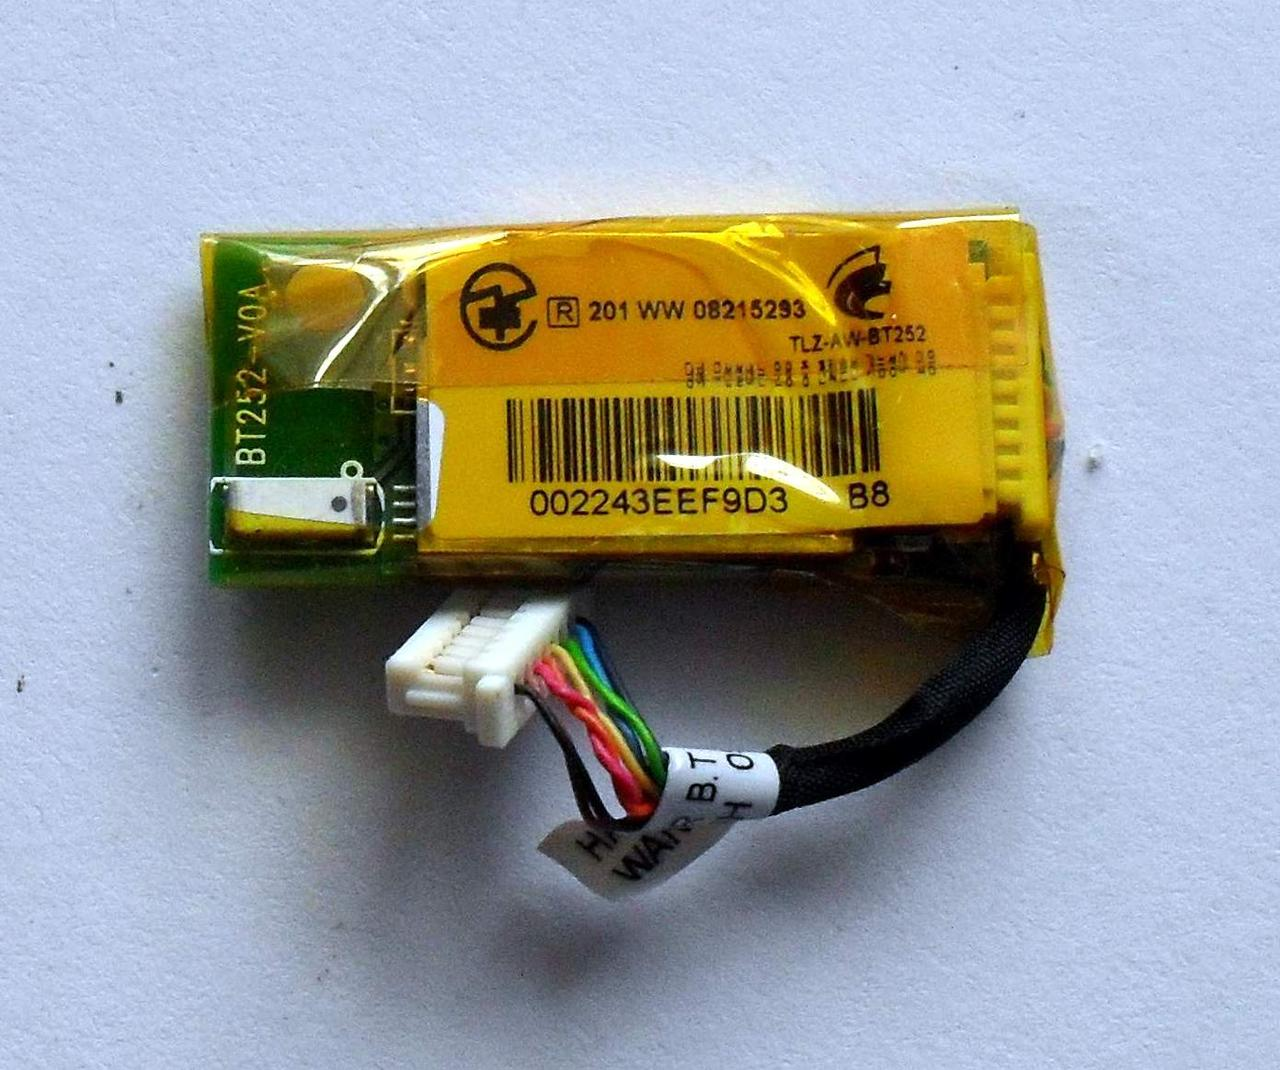 279 Bluetooth HP Mini 1000 1100 700 - BT252-V0A AW-BT252